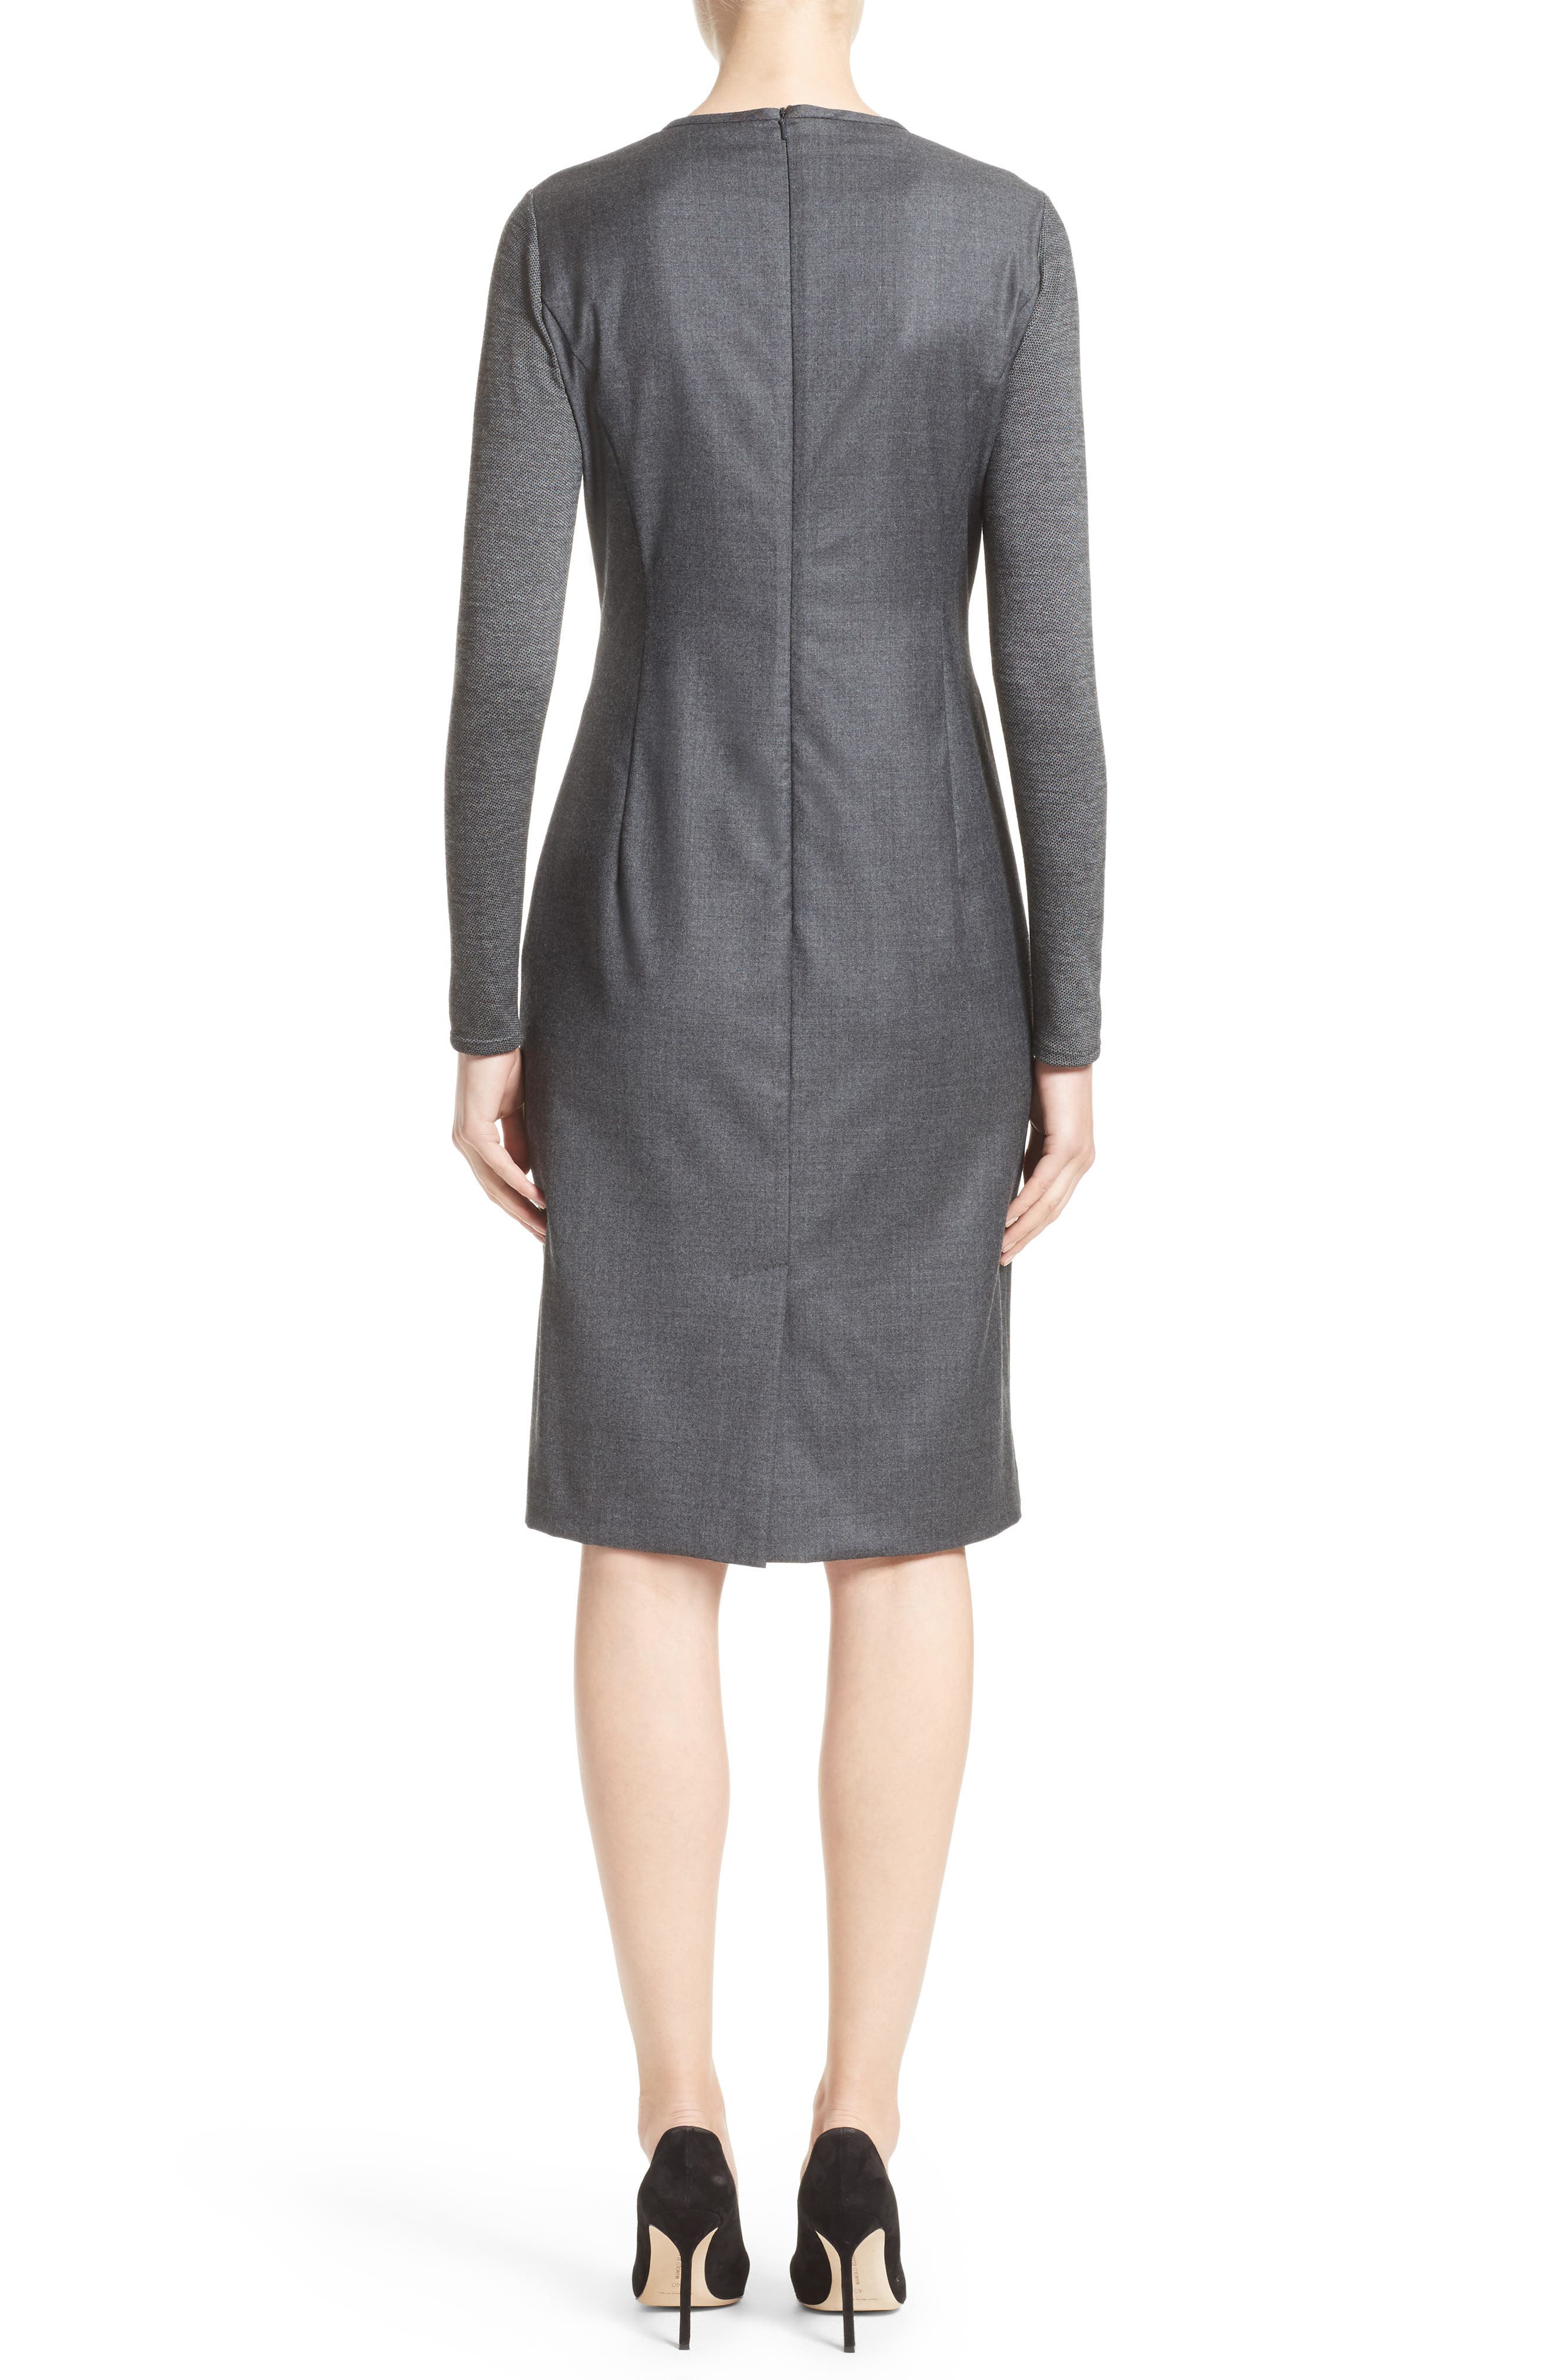 Ragazza Gathered Wool Dress,                             Alternate thumbnail 2, color,                             Dark Grey